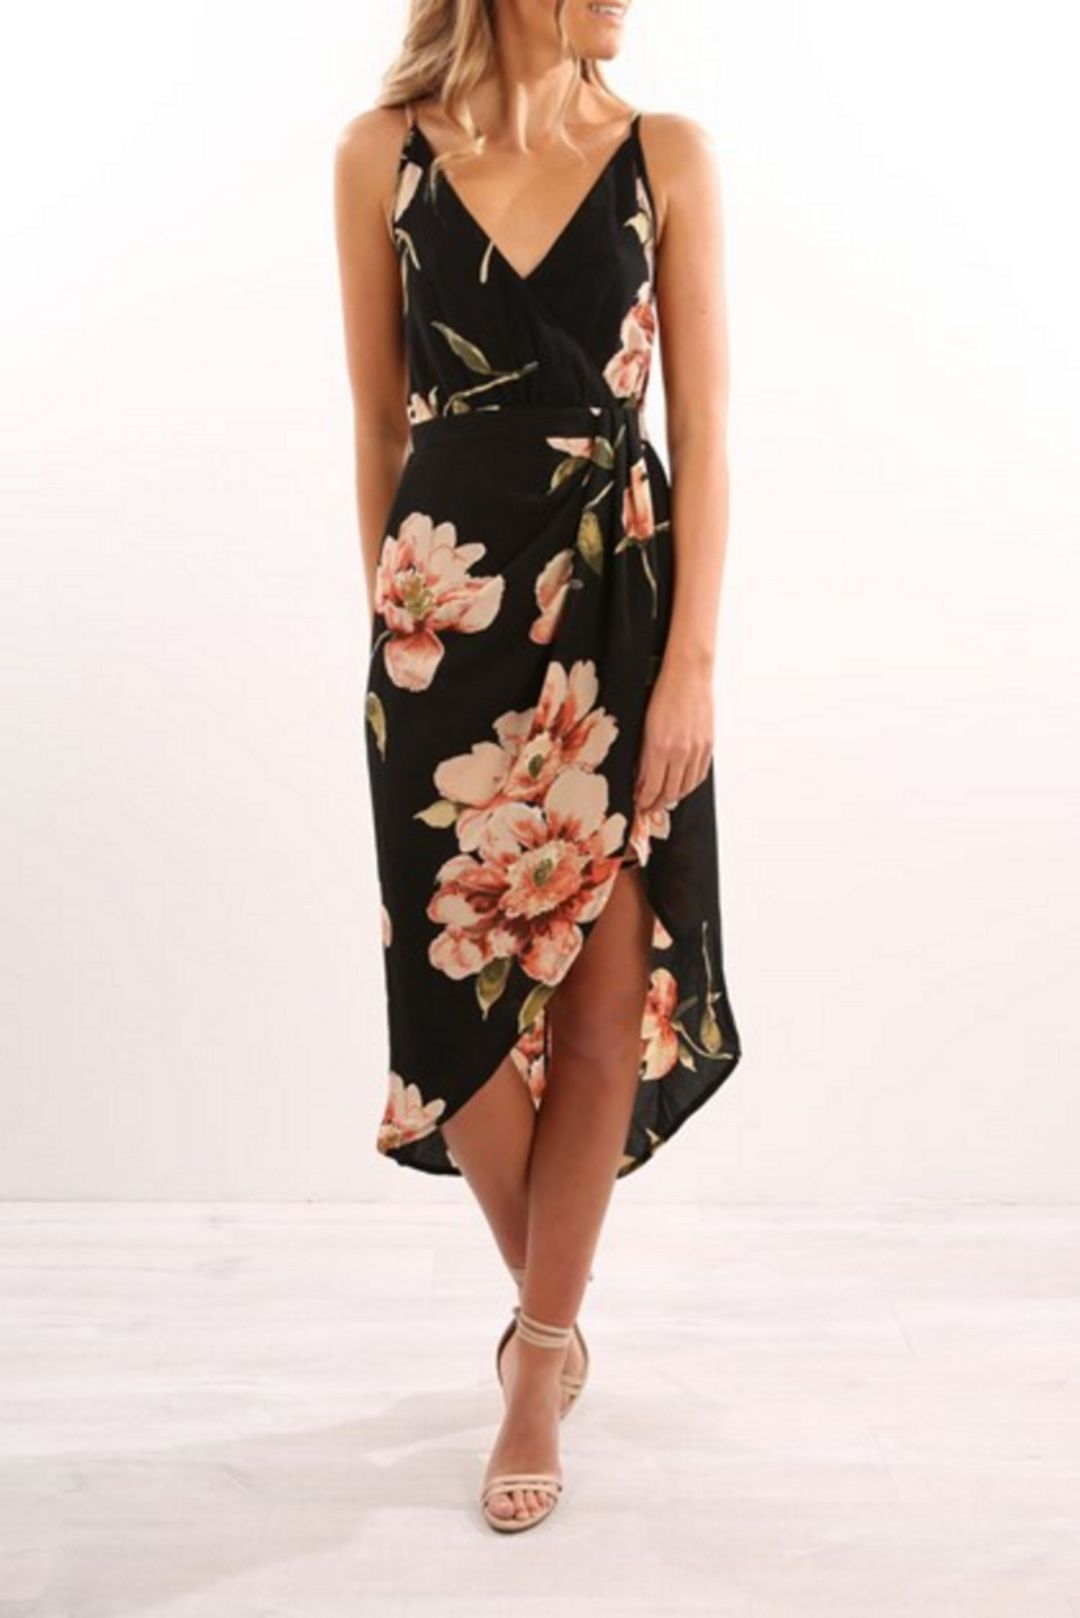 Cozy 35 Best Floral Dress Ideas For Women Look More Pretty Http Uniqlog Com 35 Best Floral Dress Ideas For Women Look Mo Trendy Dresses Fashion Guest Attire [ 1618 x 1080 Pixel ]